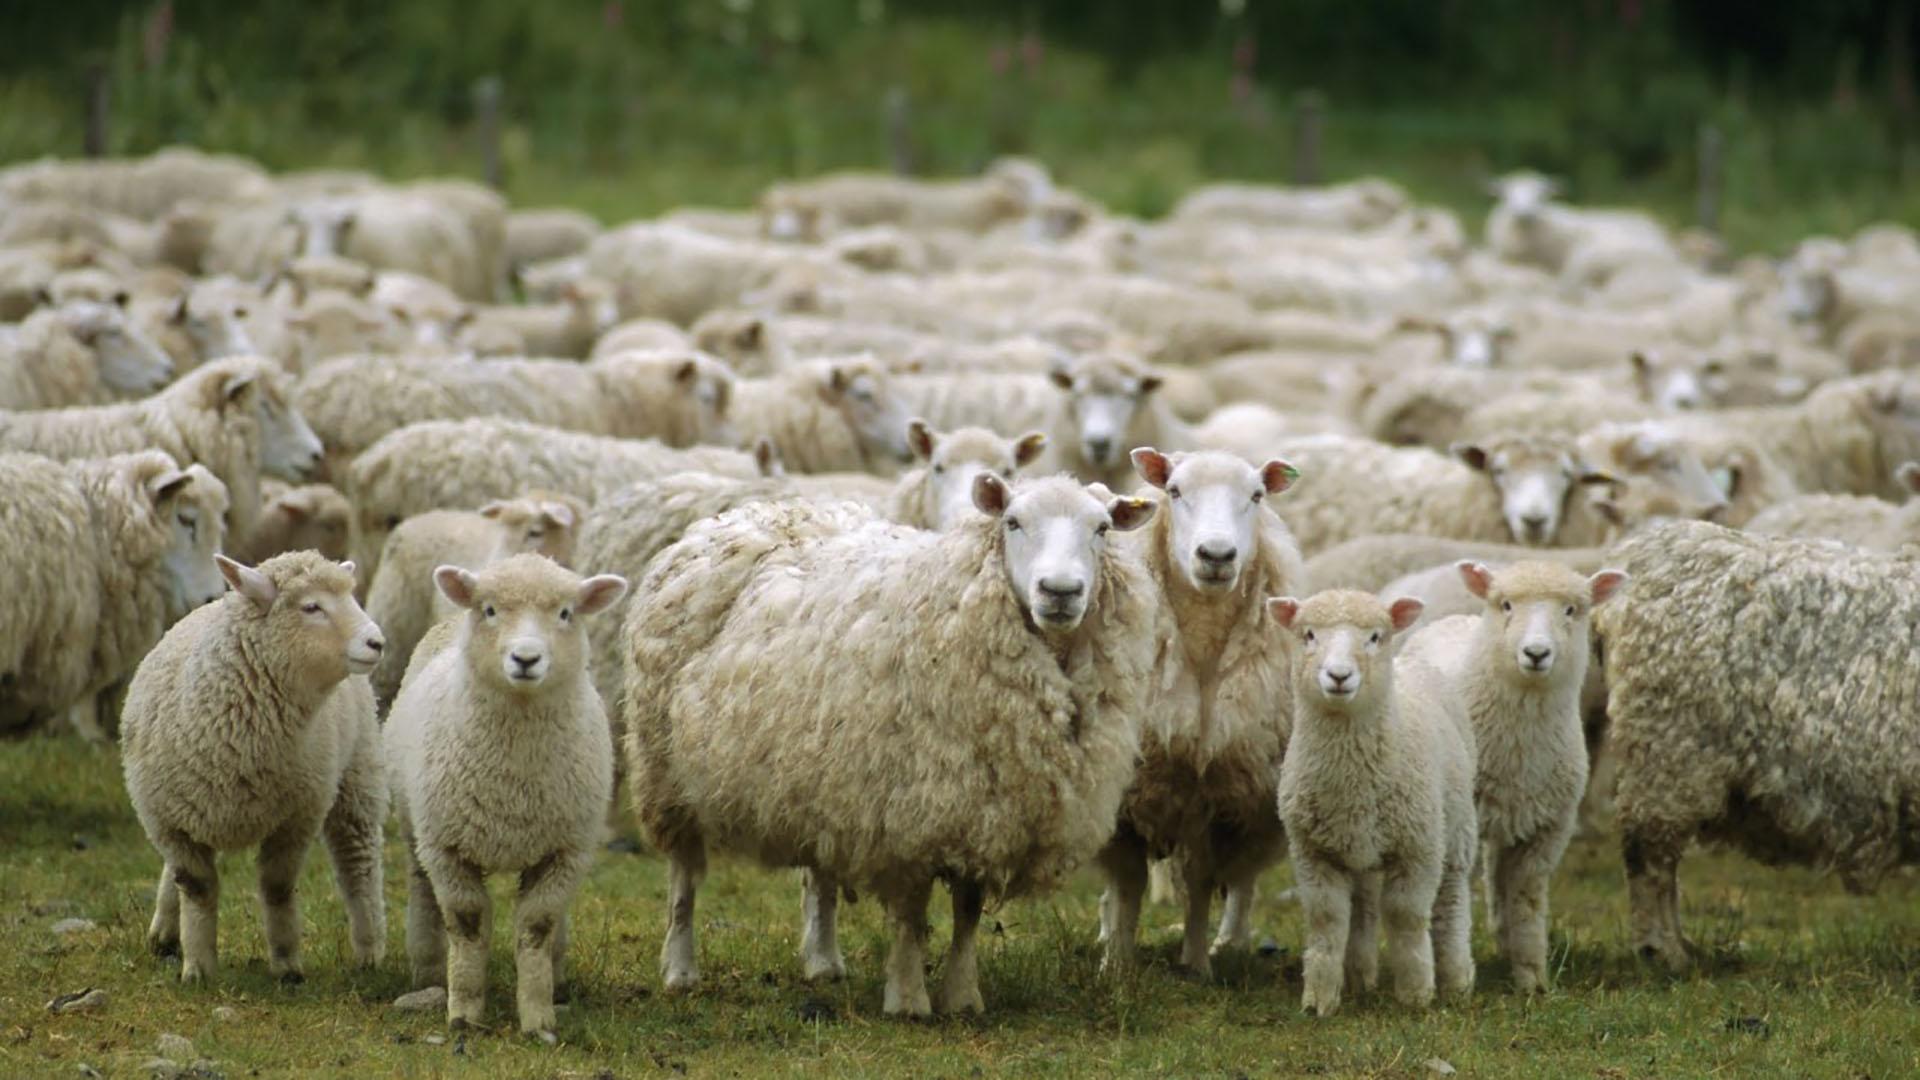 SENASA: Uso de productos veterinarios para ectoparásitos en ovinos.